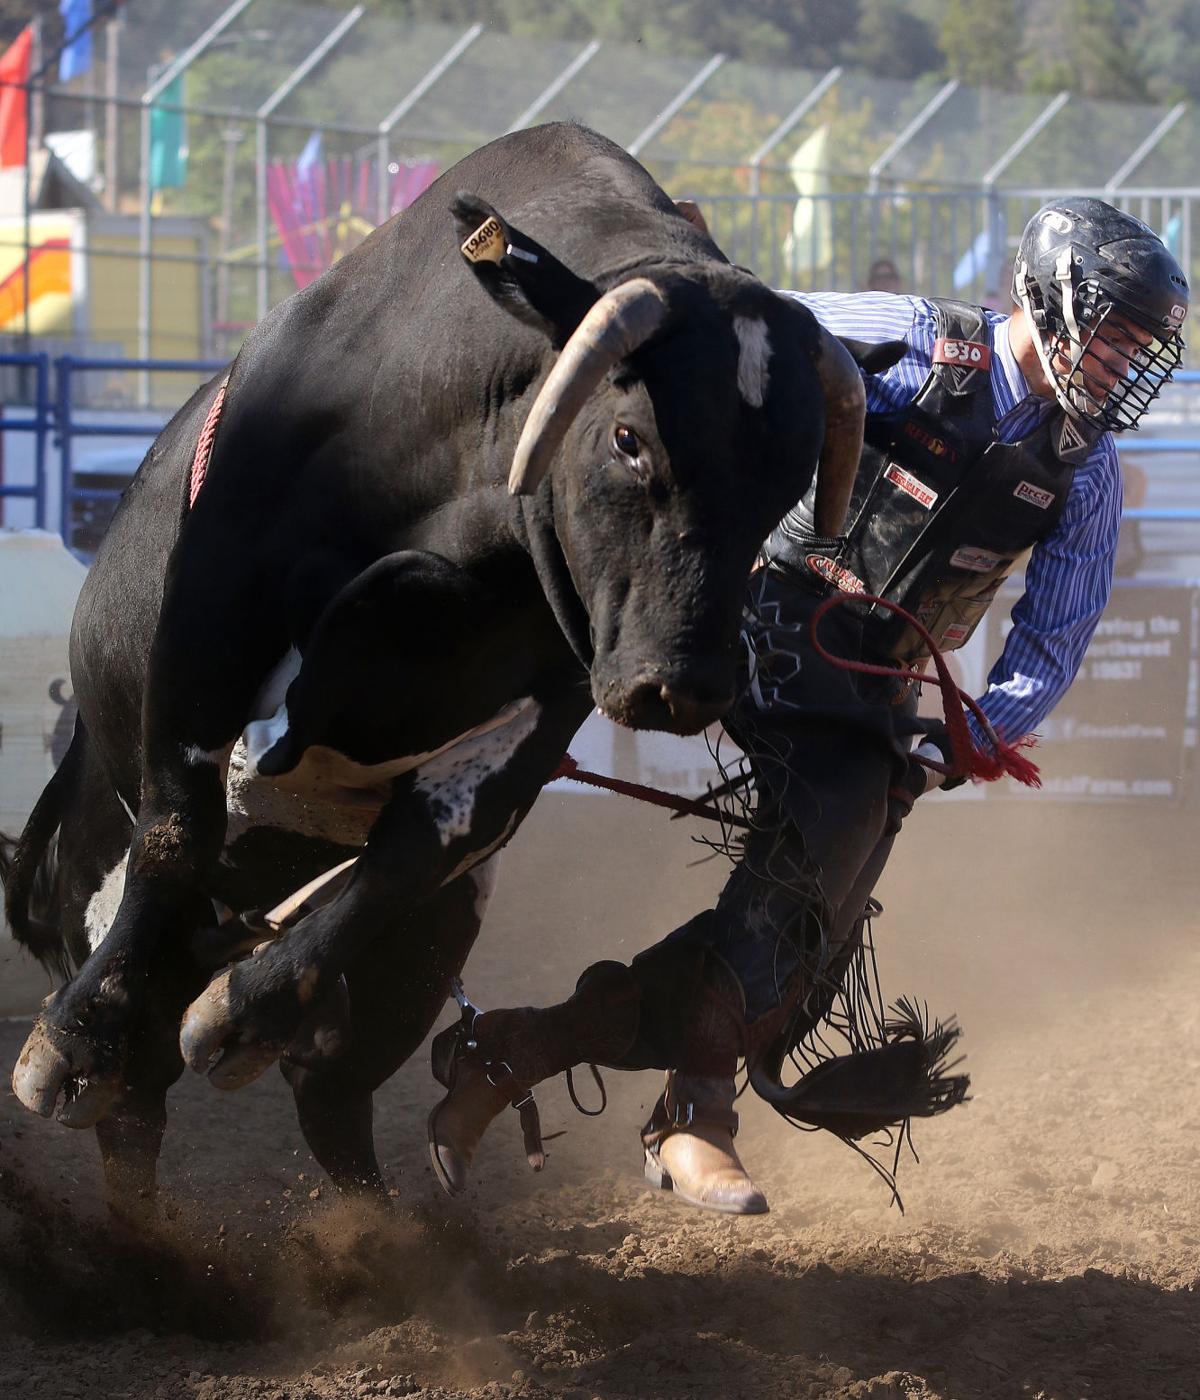 170813-spt-bullriding-01